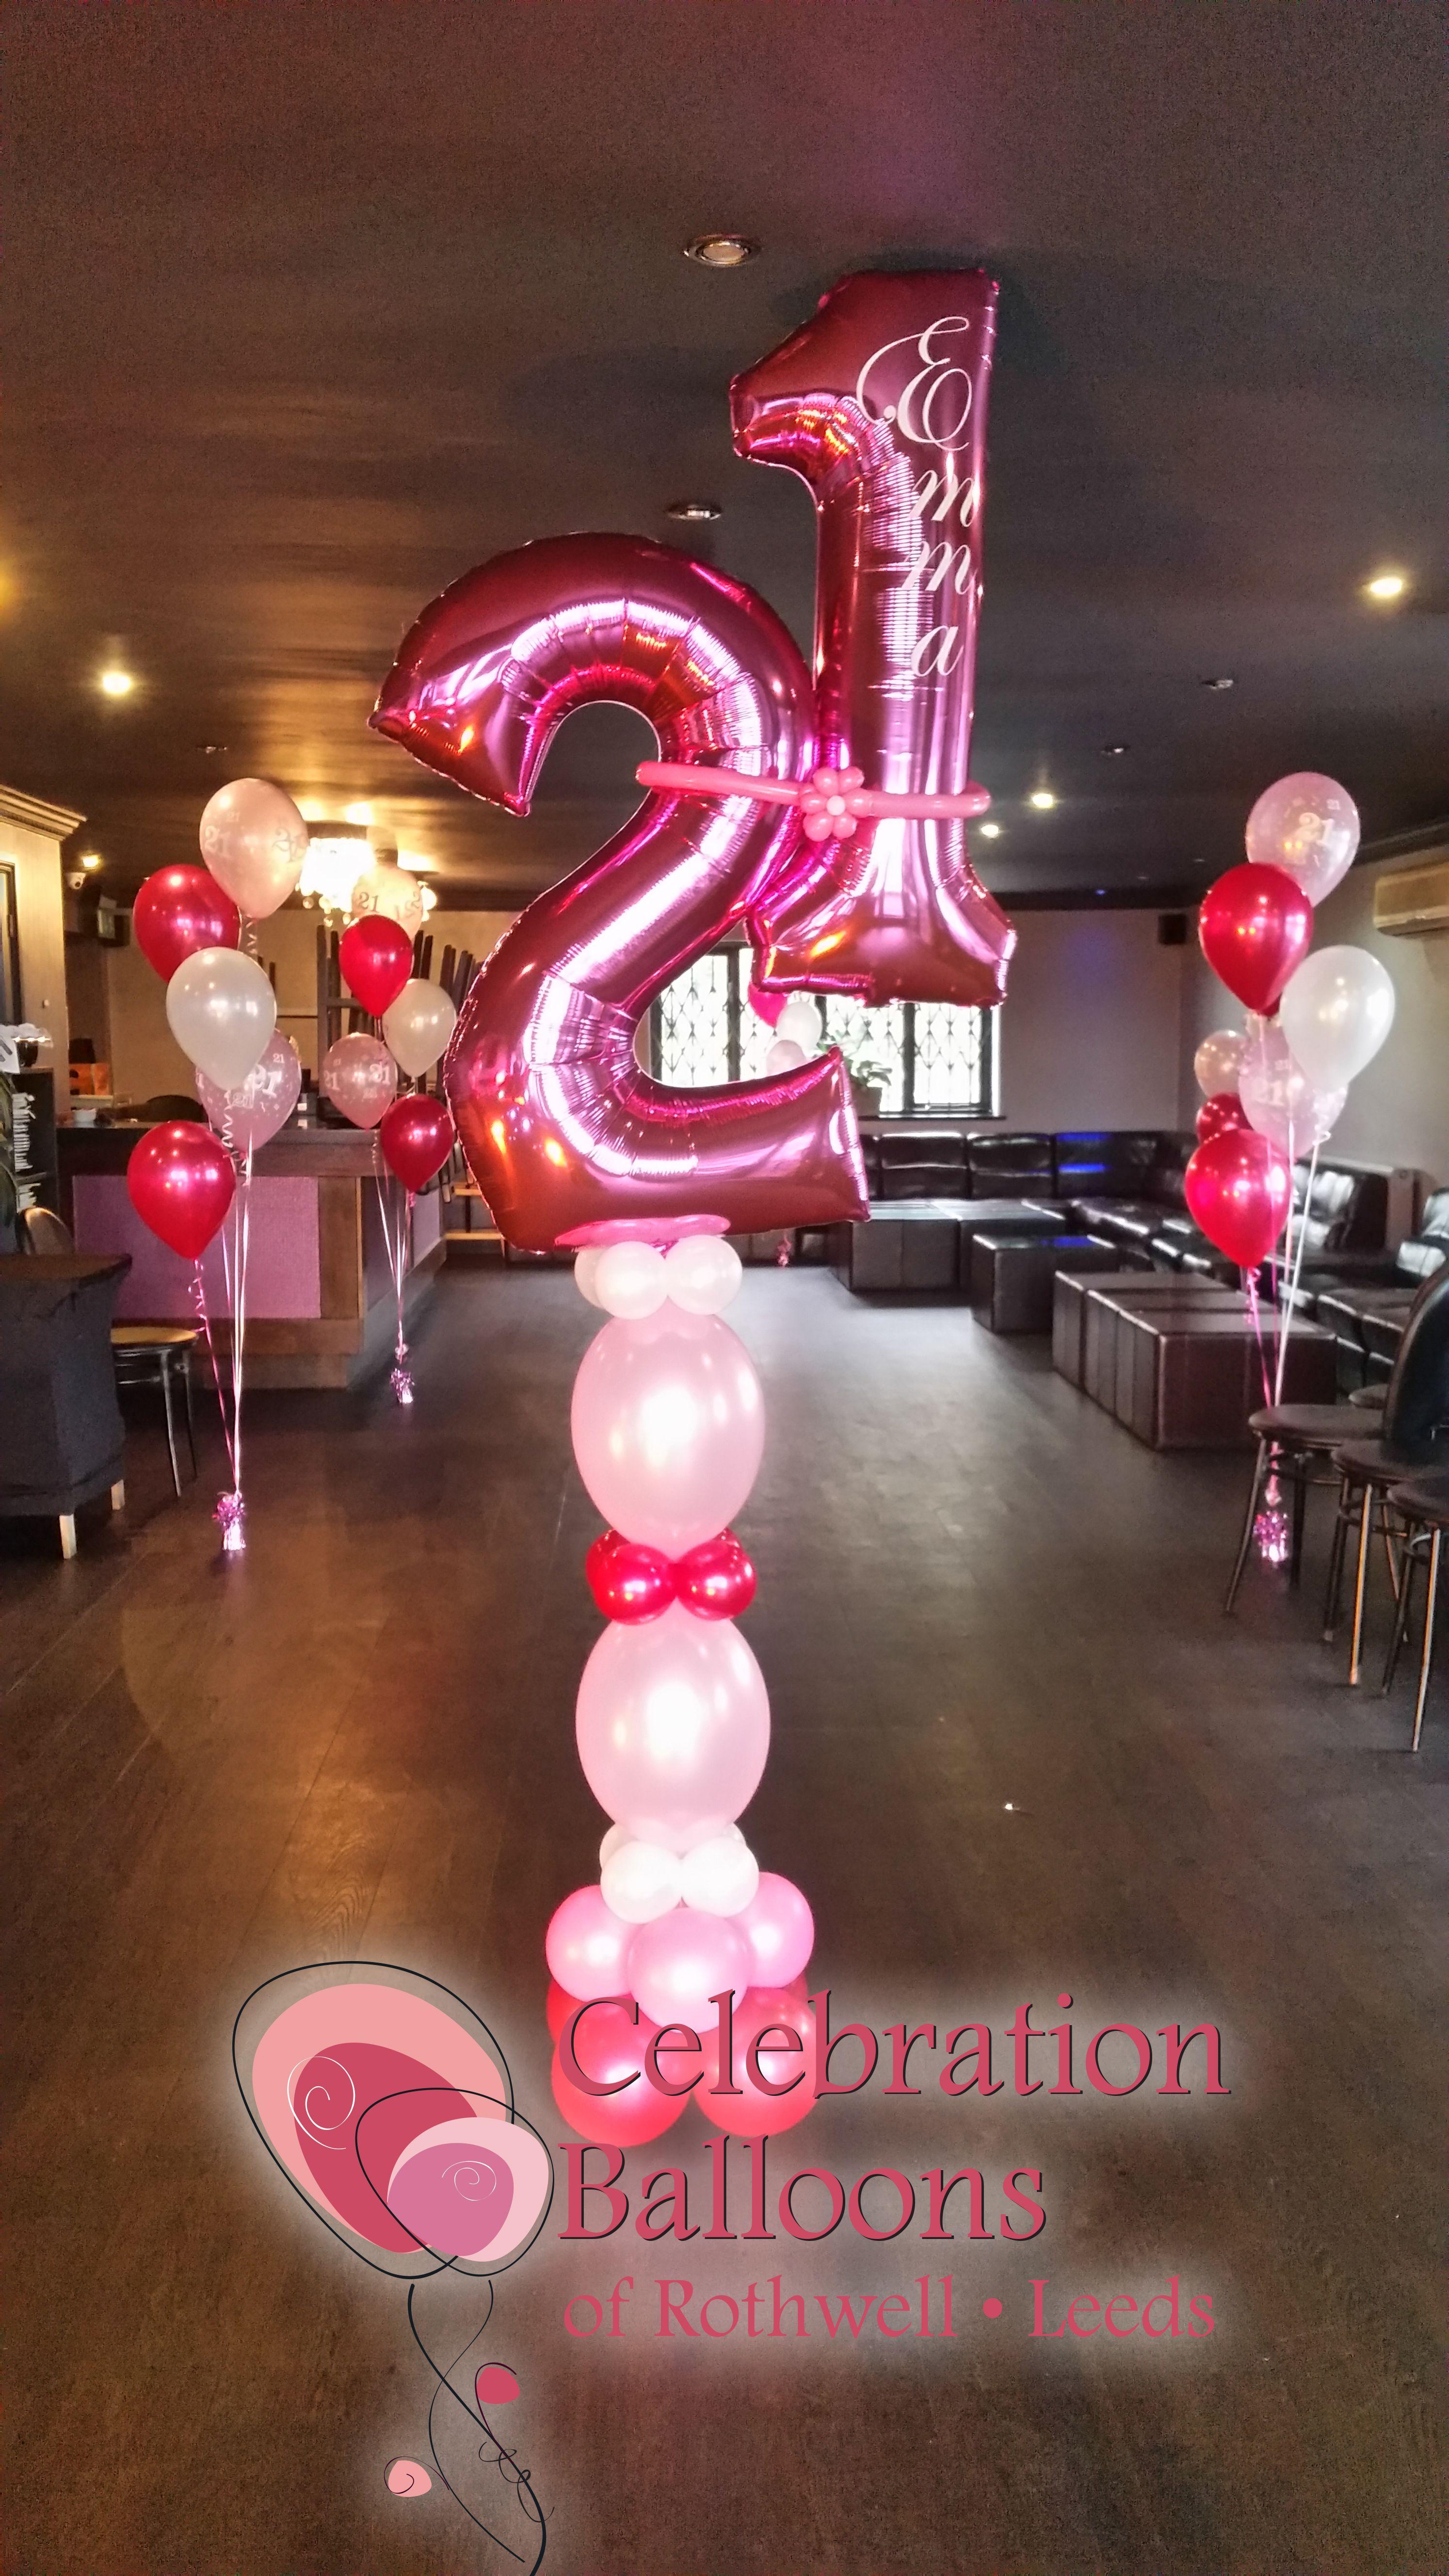 Personalised 21st Birthday Balloon column from wwwballoonsleedscom